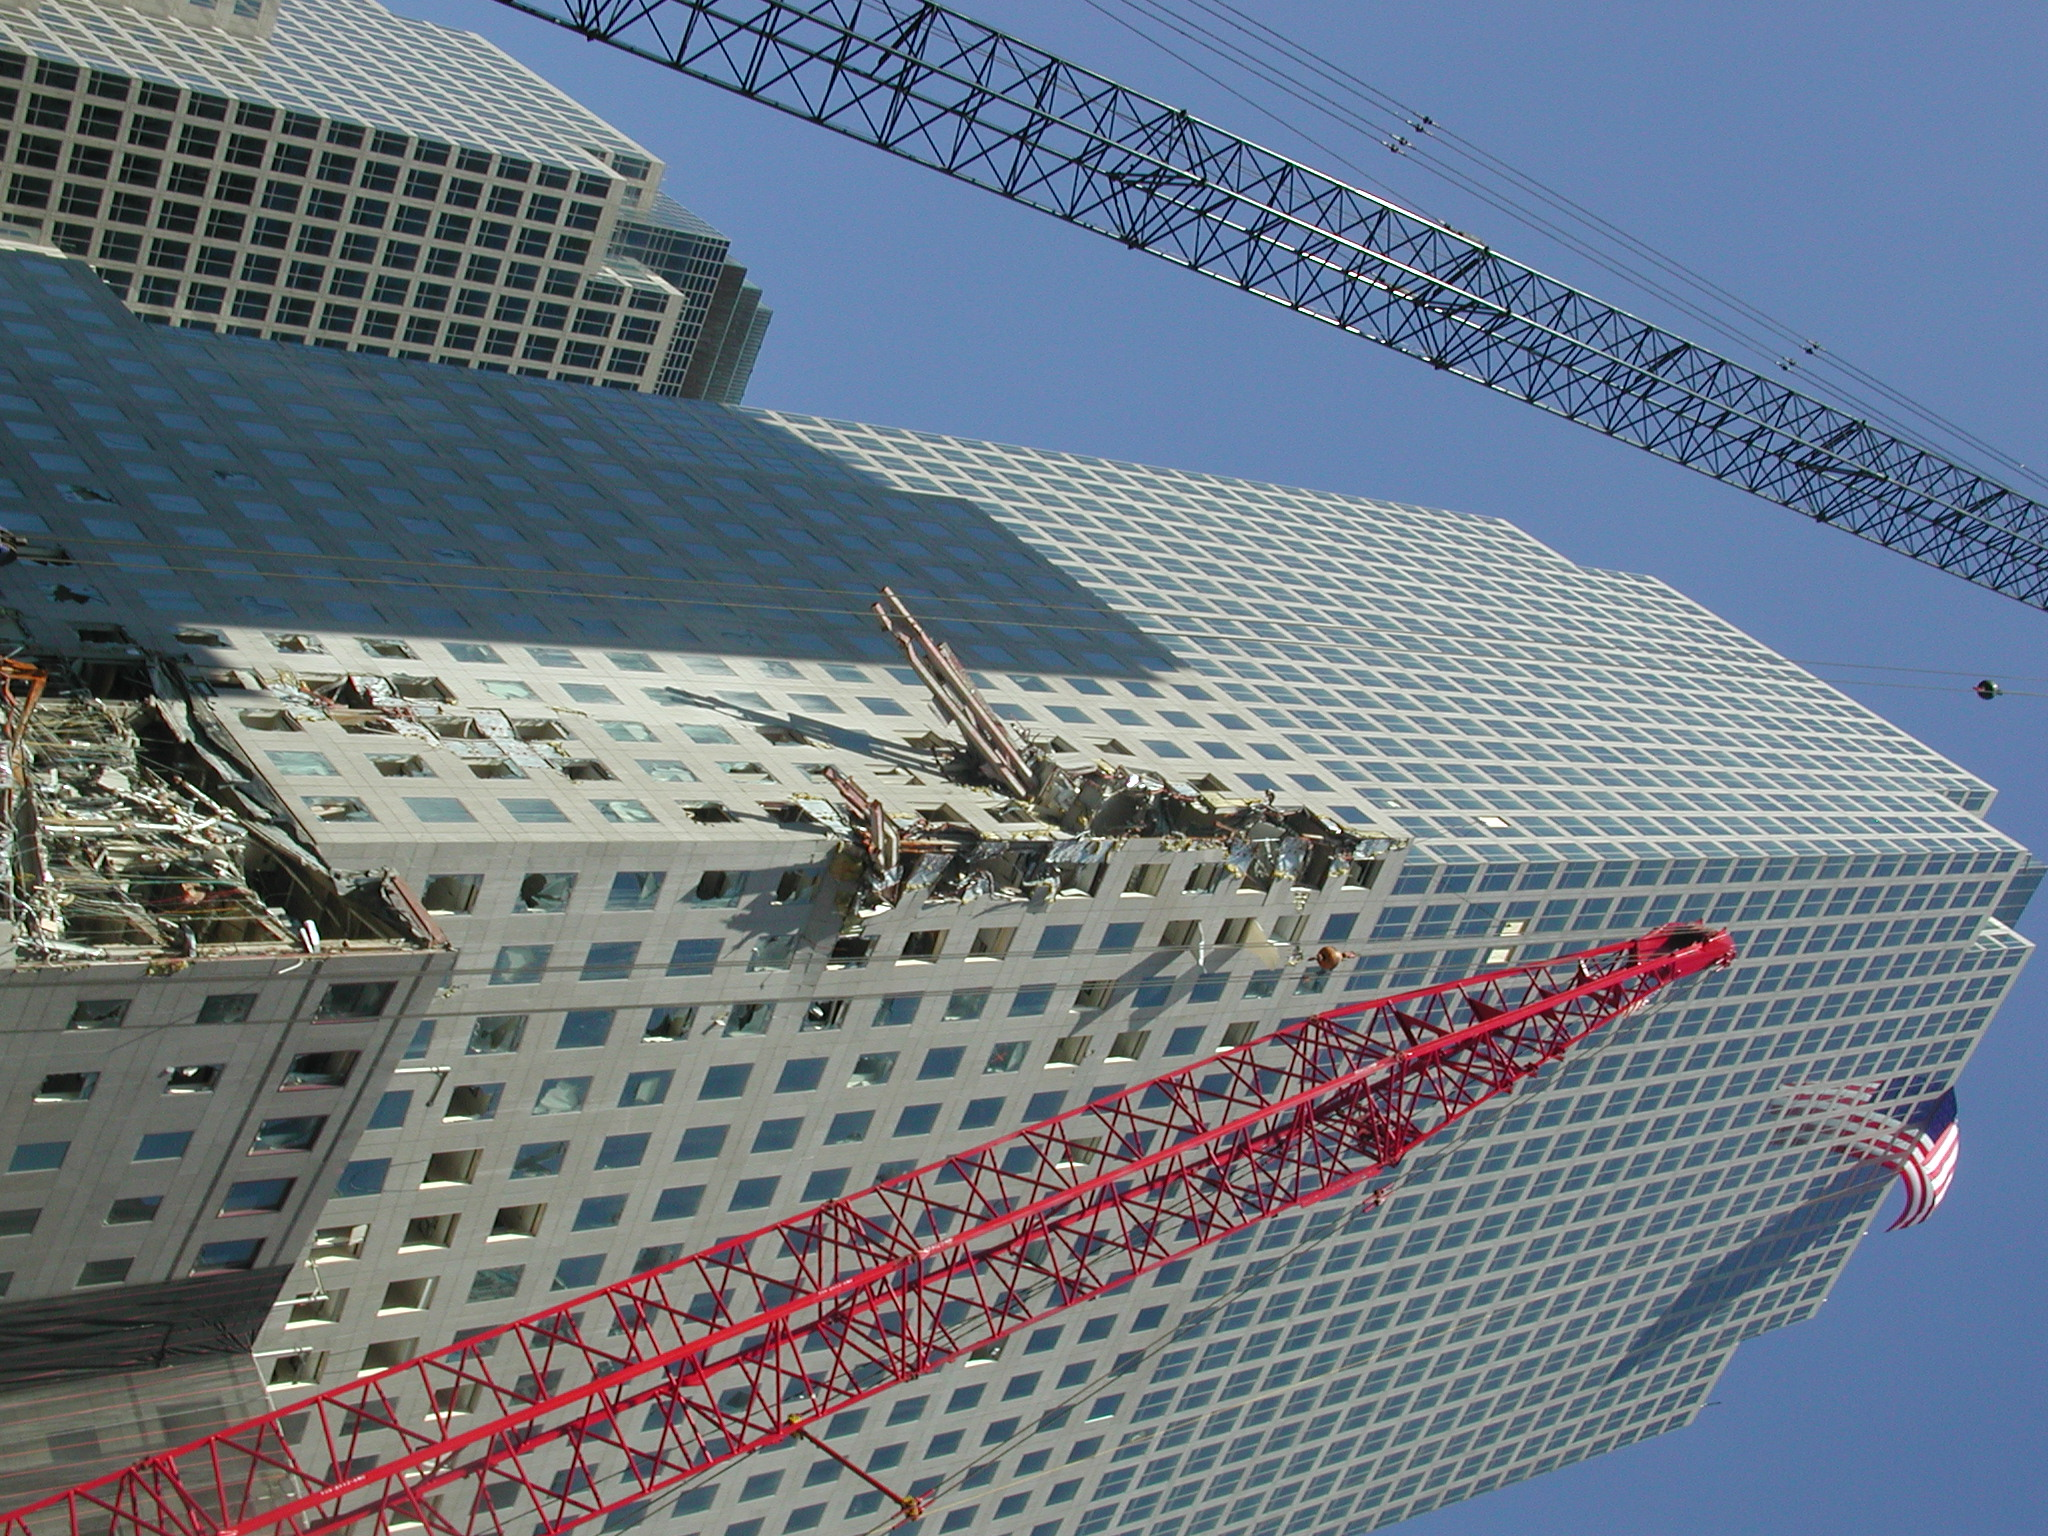 world trade center photographs 3 october 2001